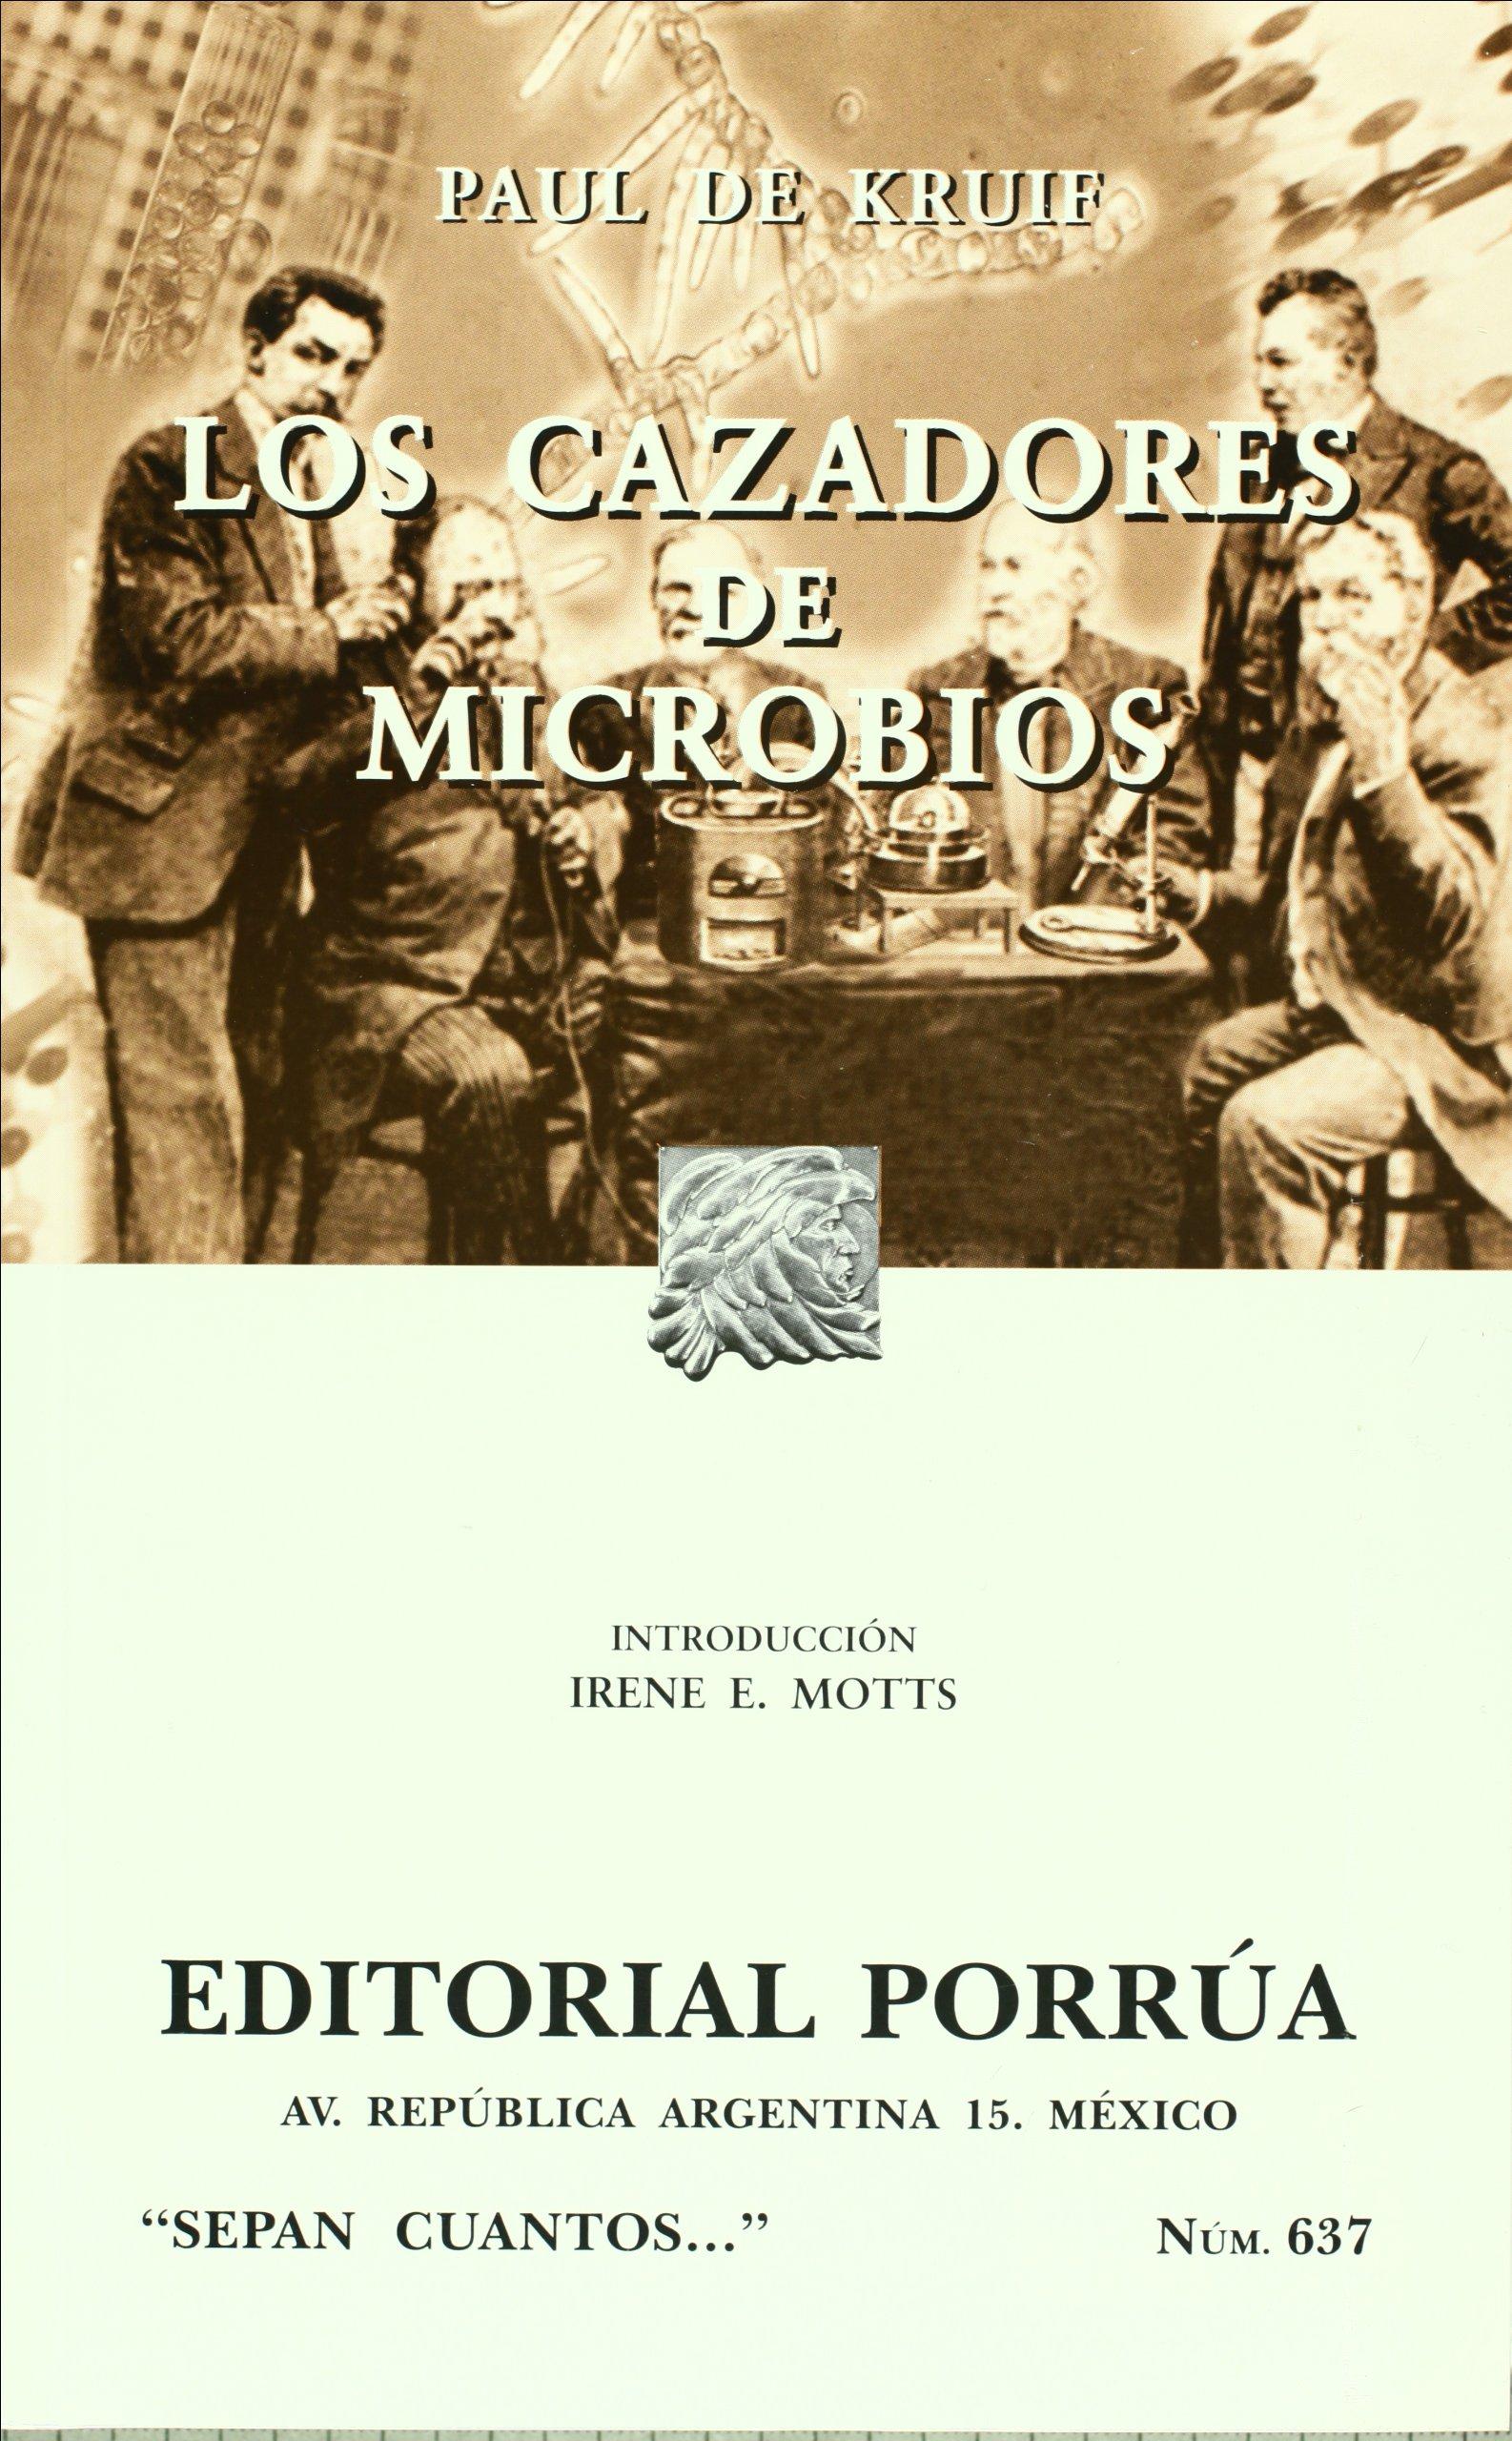 Los cazadores de microbios paul de kruif editorial porr a s a de c v amazon com mx libros